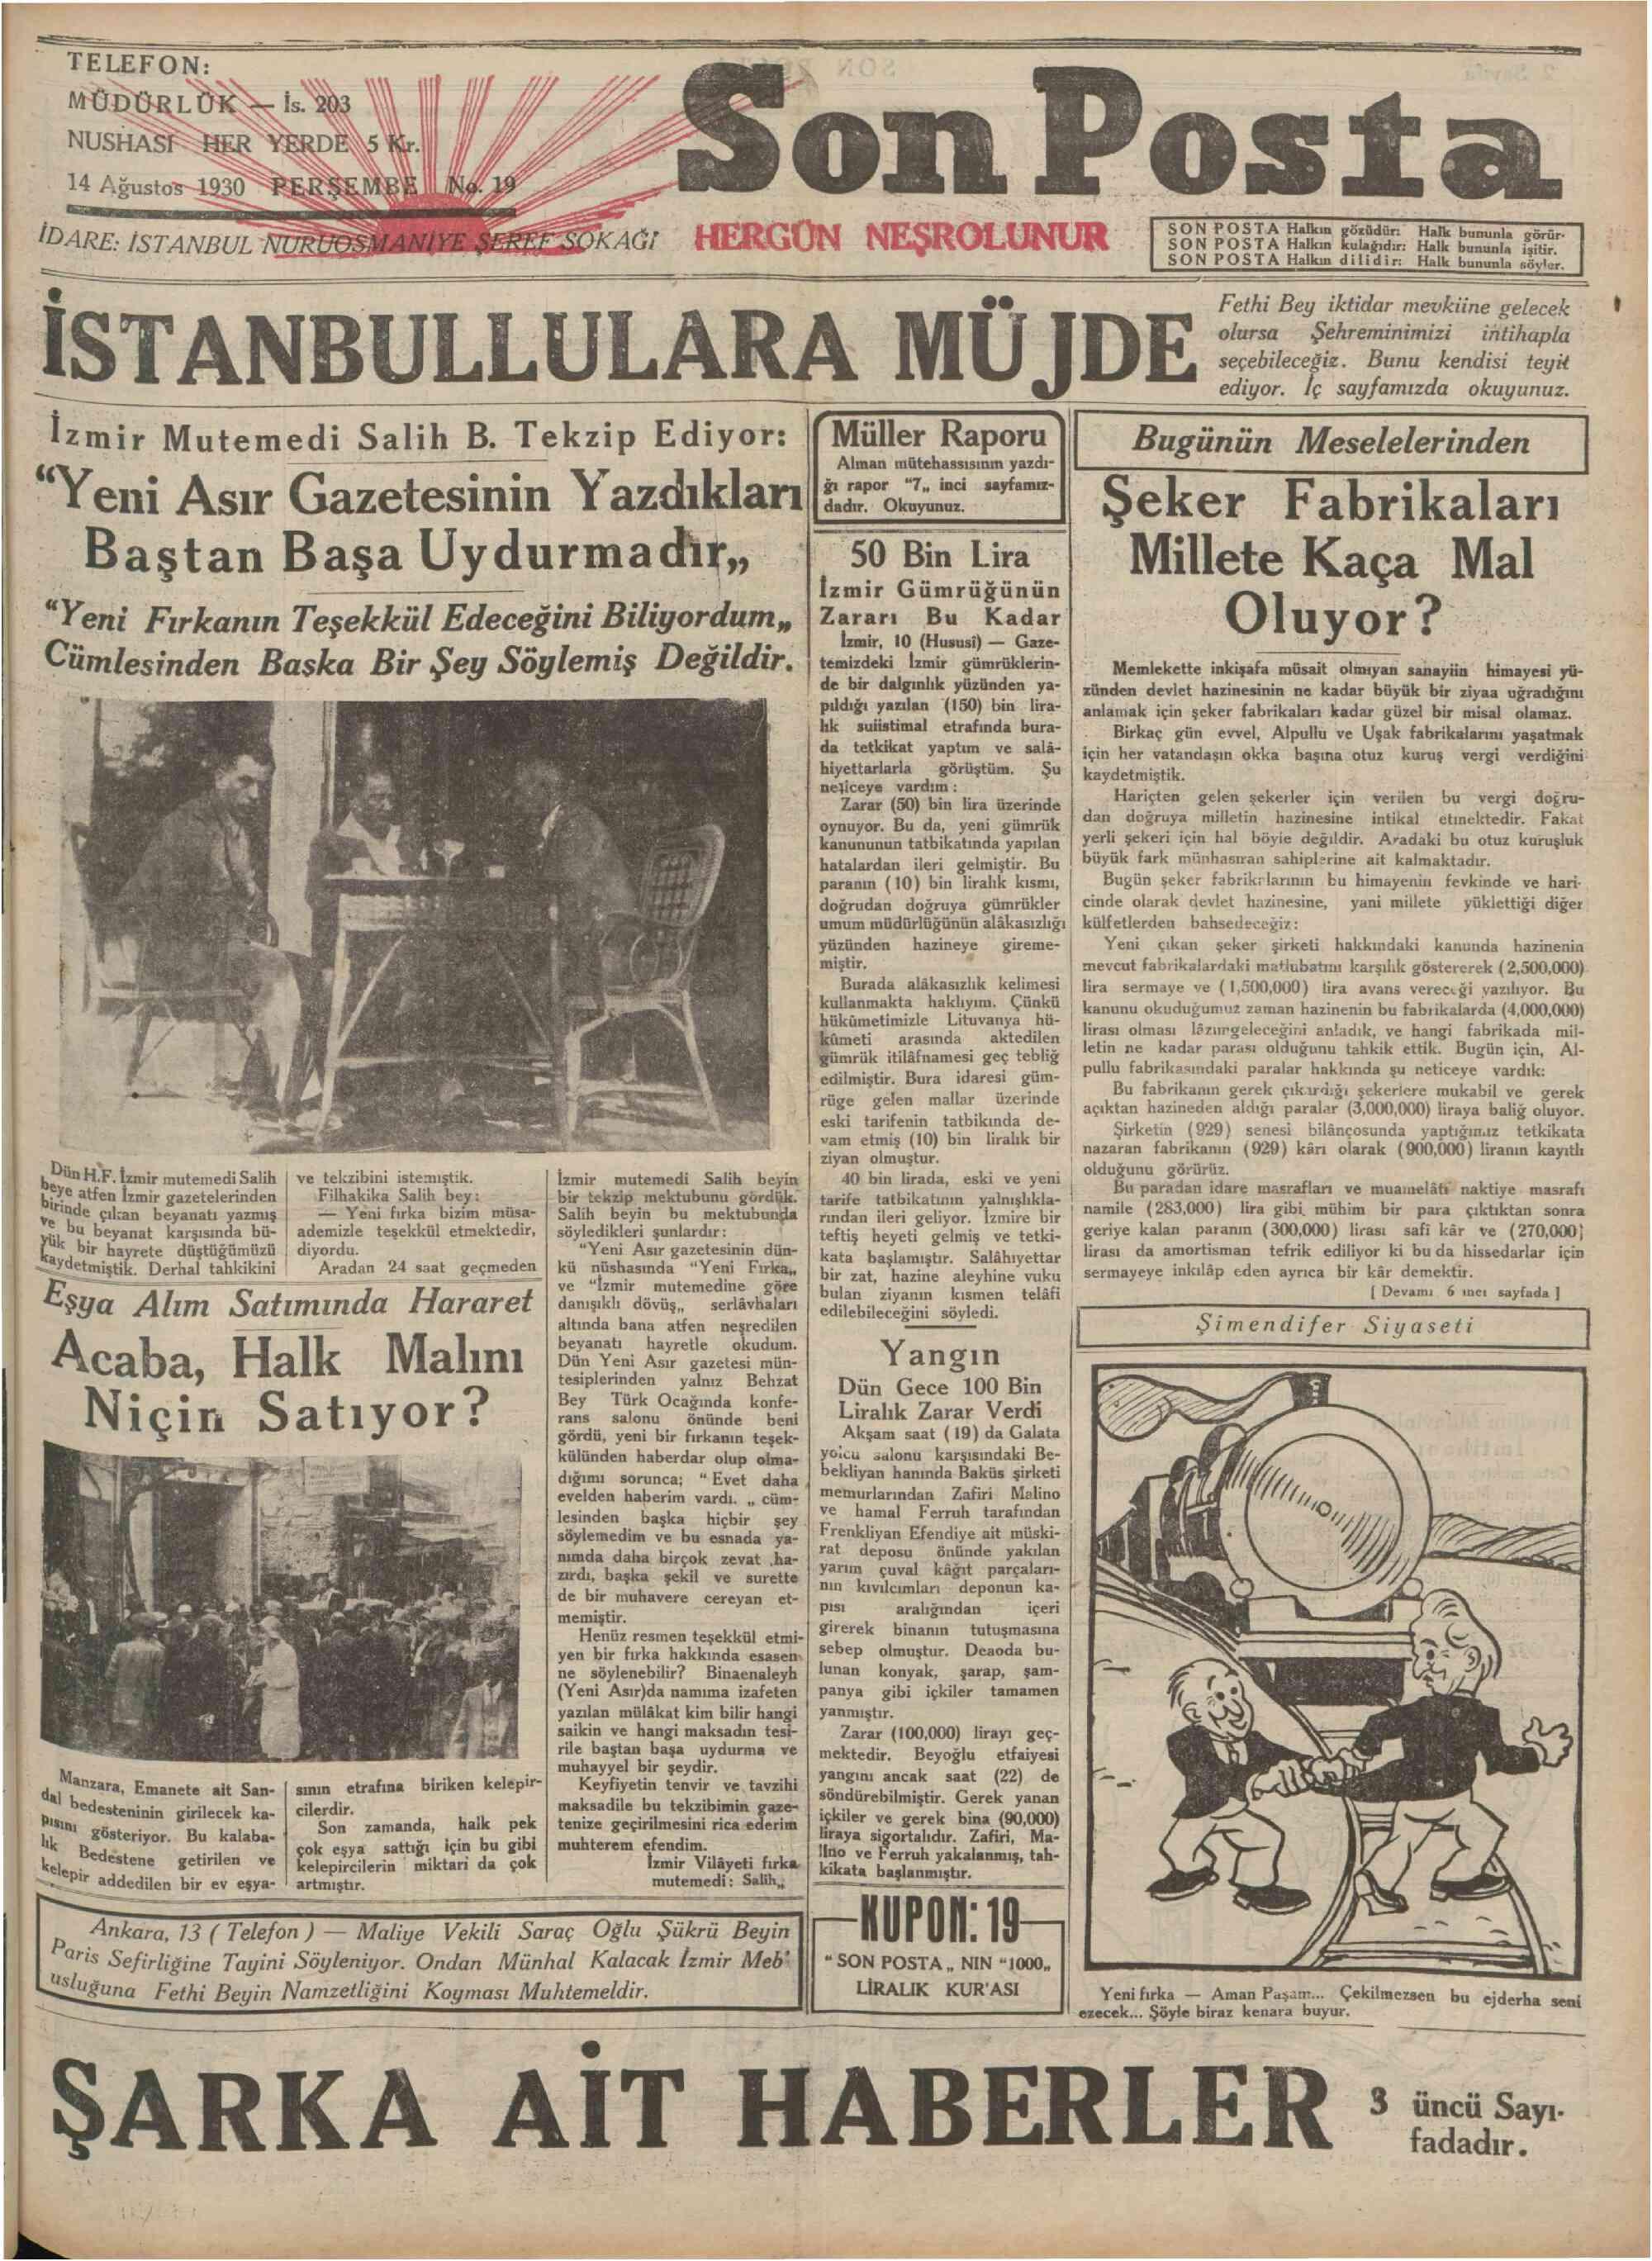 14 Ağustos 1930 Tarihli Son Posta Gazetesi Sayfa 1